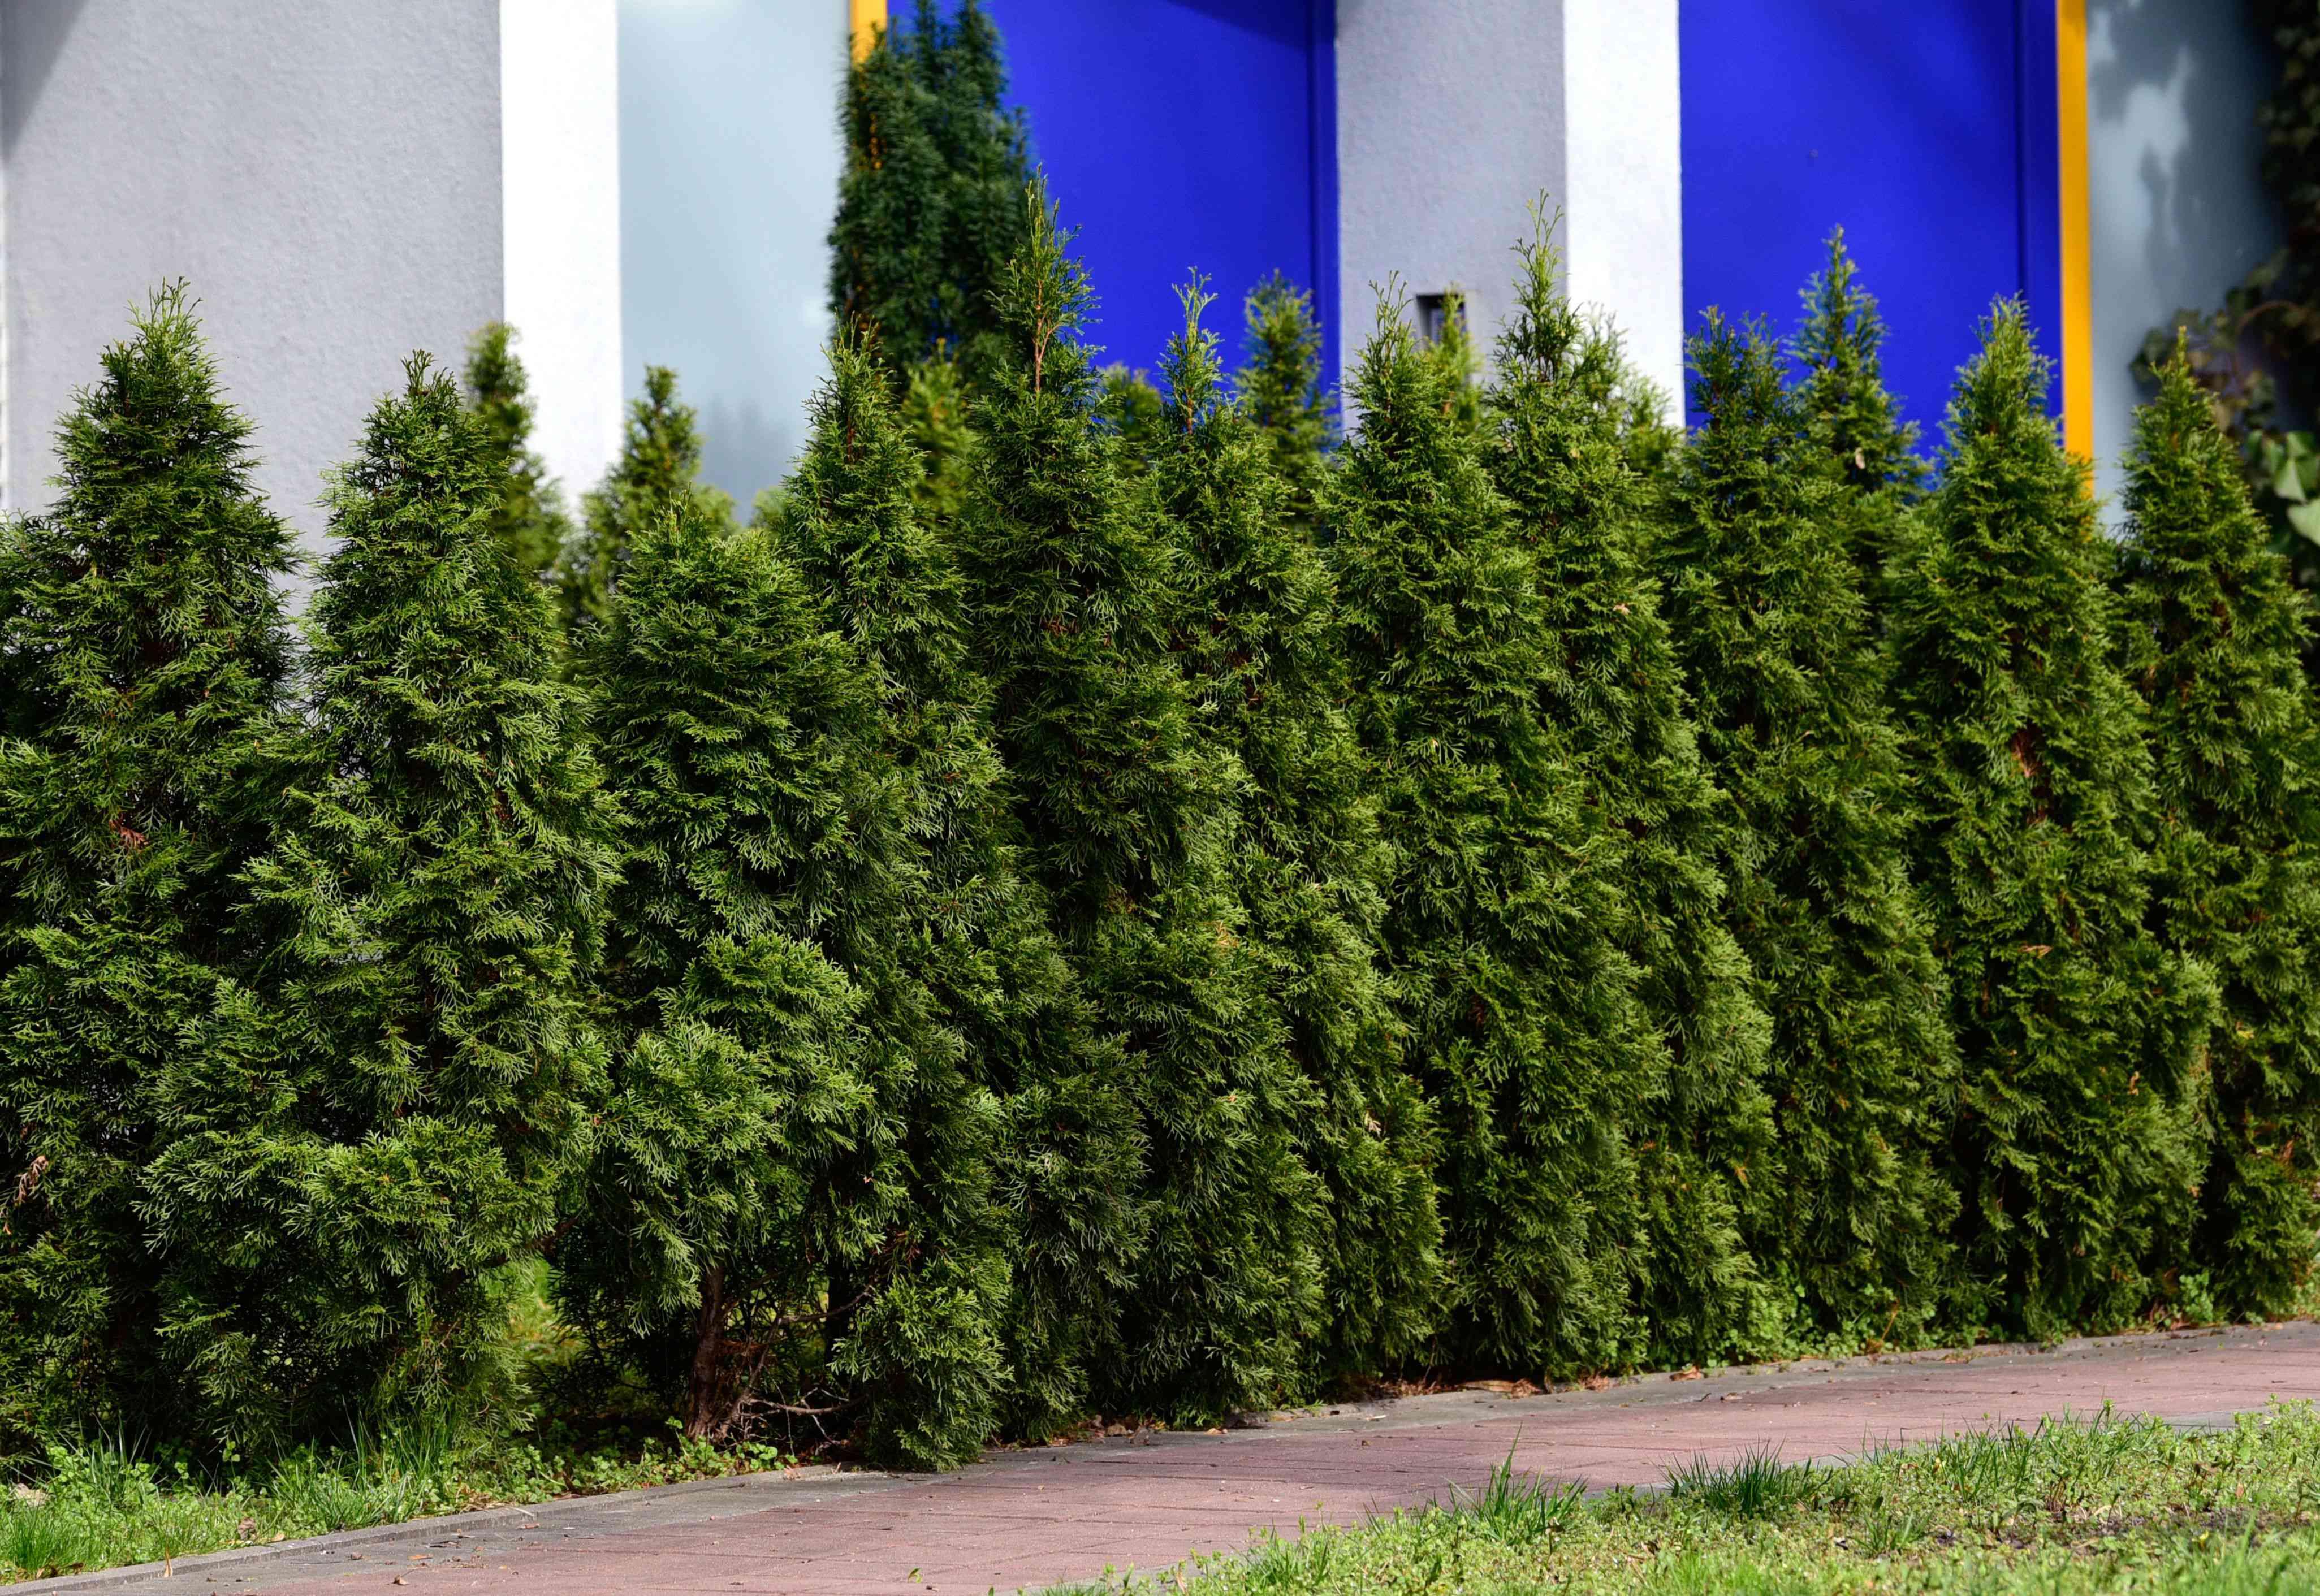 Arborvitae trees trimmed in pyramidal shapes near side of sidewalk